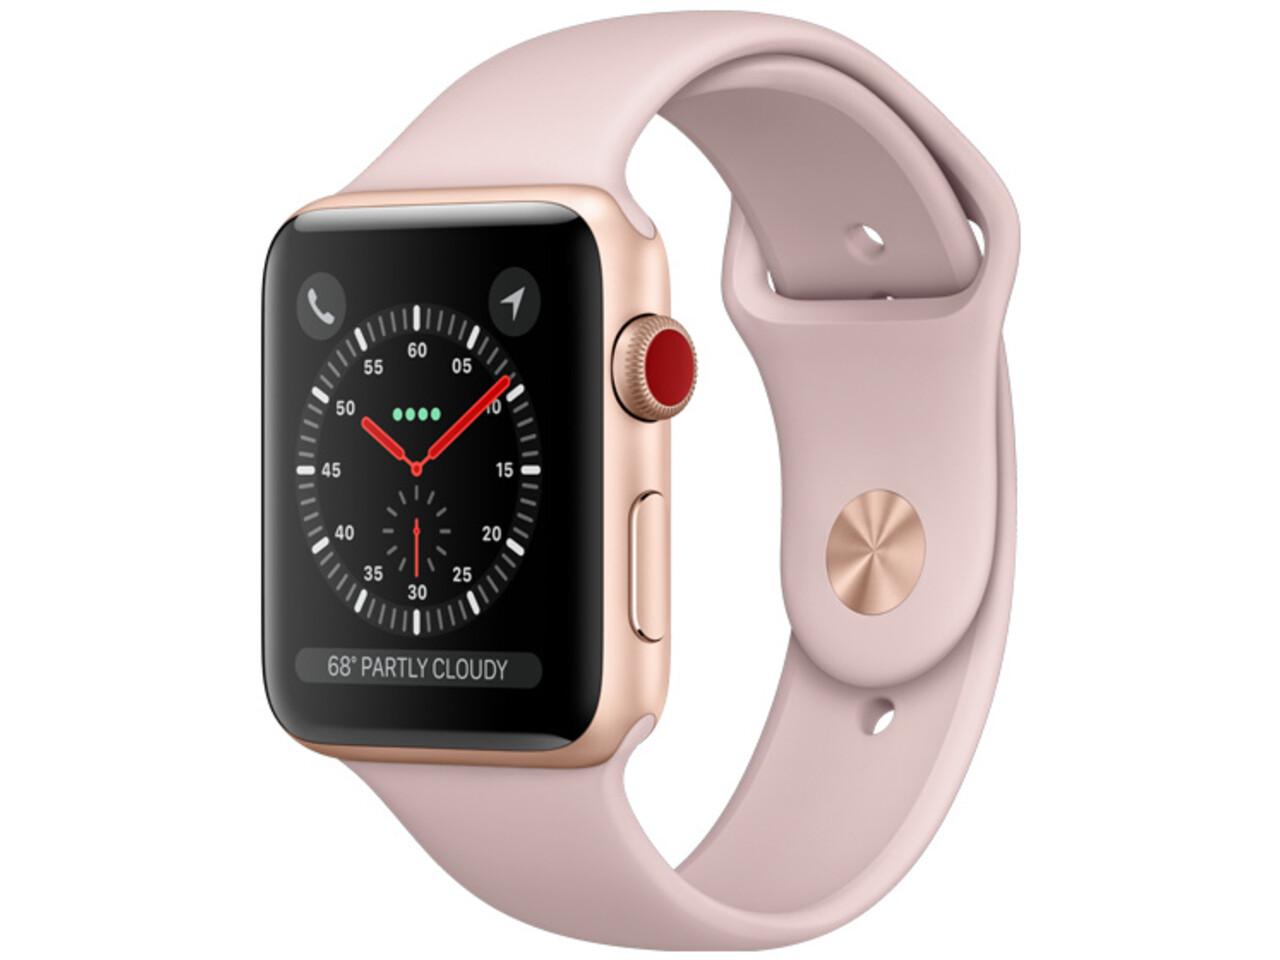 apple watch series 3 cellular 38mm gold aluminum pink sand sport band